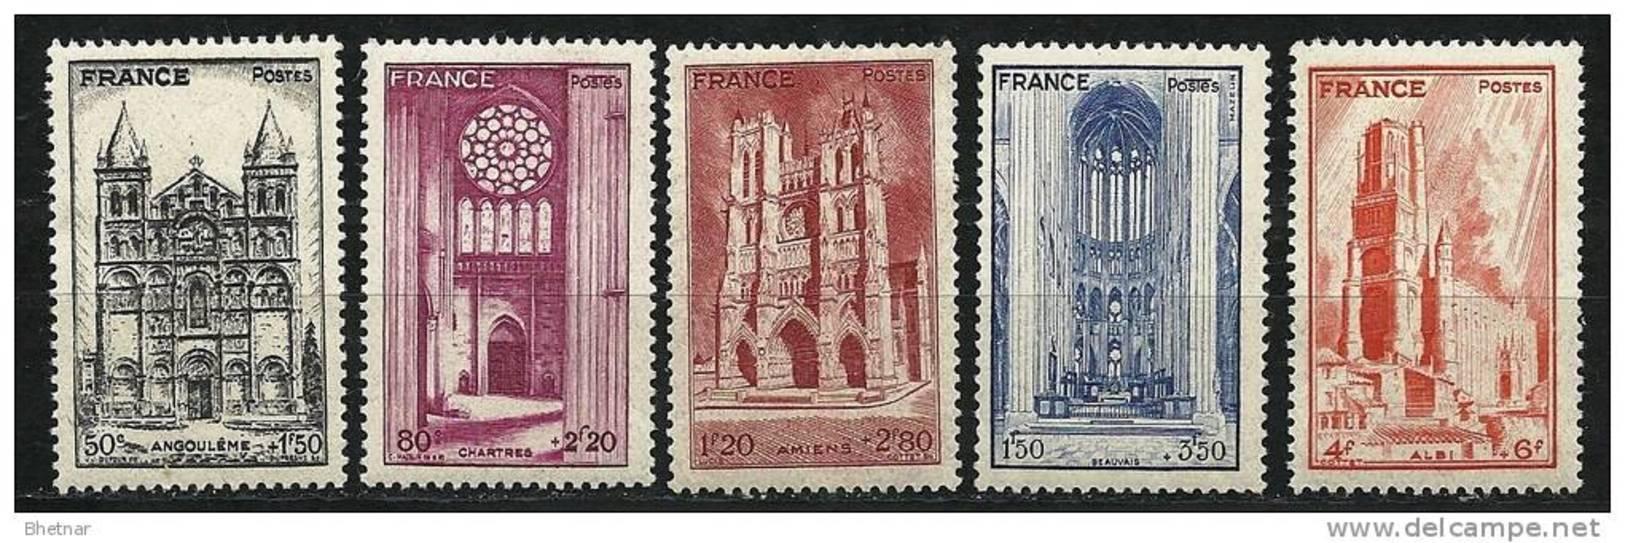 "FR YT 663 à 667 "" Cathédrales "" 1944 Neuf** - Unused Stamps"